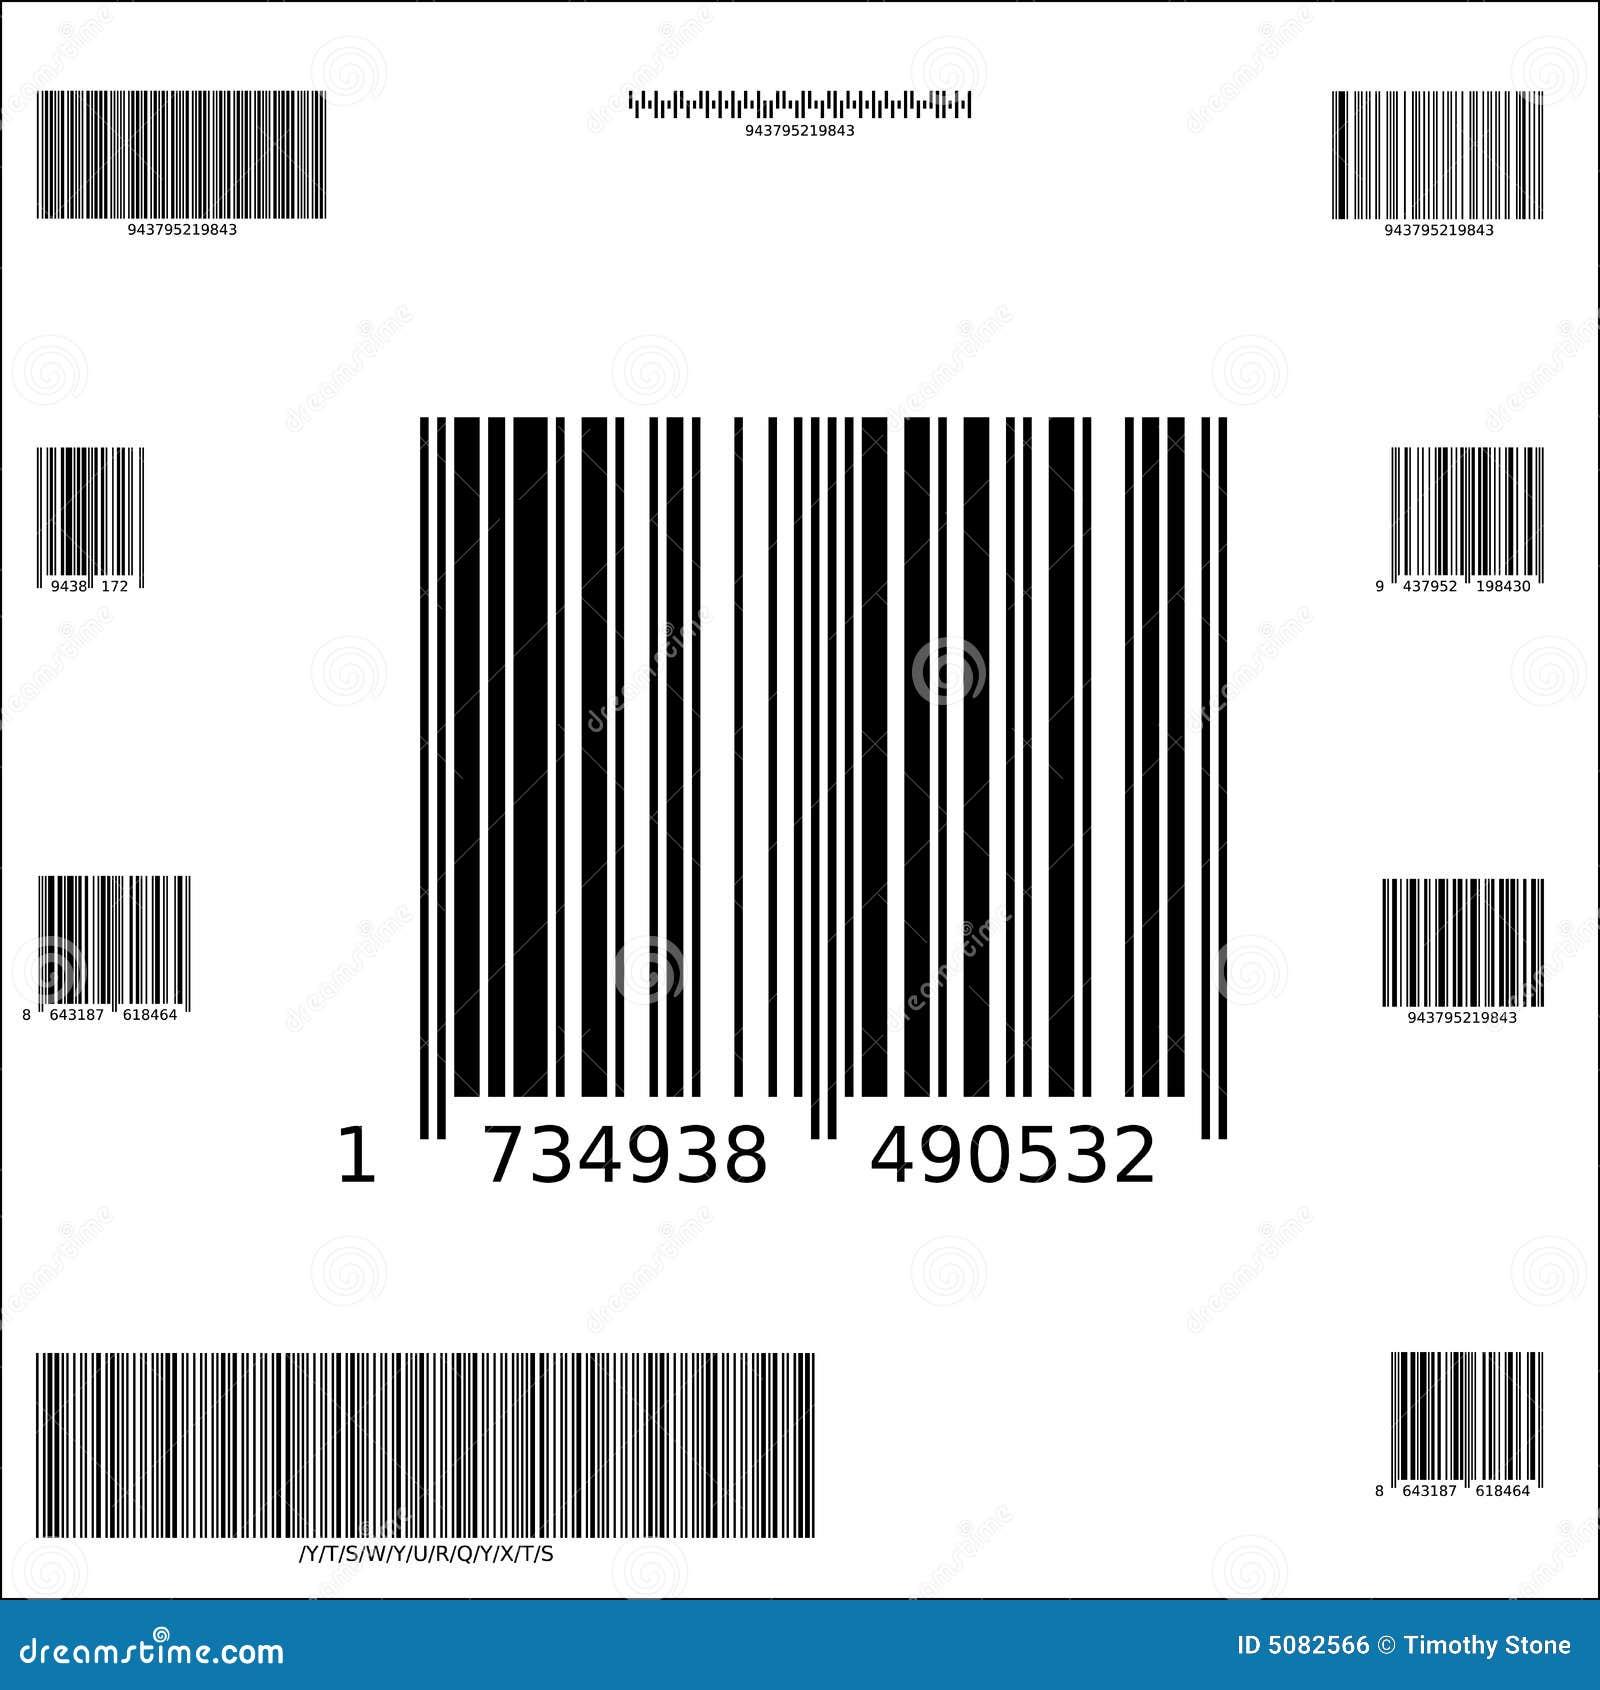 Dez códigos de barras do vetor da amostra